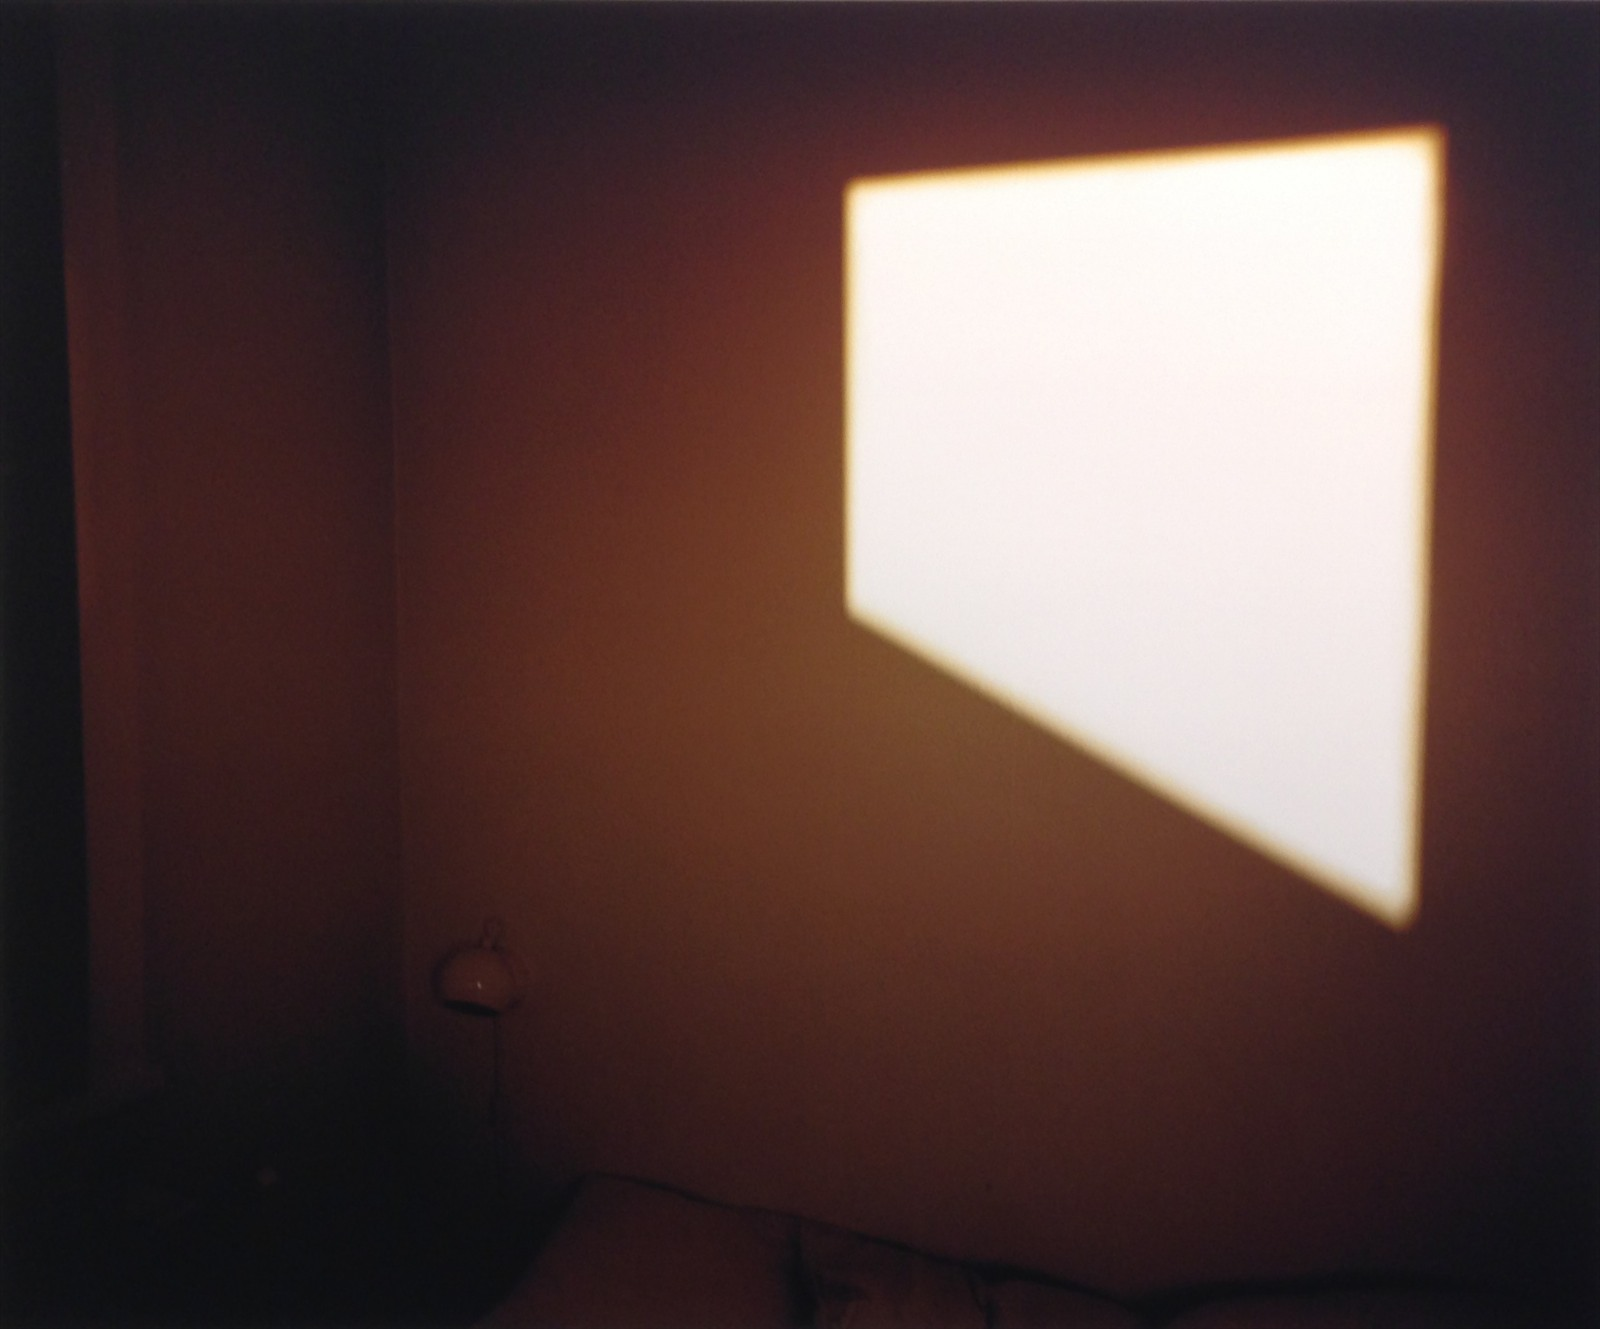 trapezoid II, 2010, giclée print, 100 x 125 cm, ed. 5